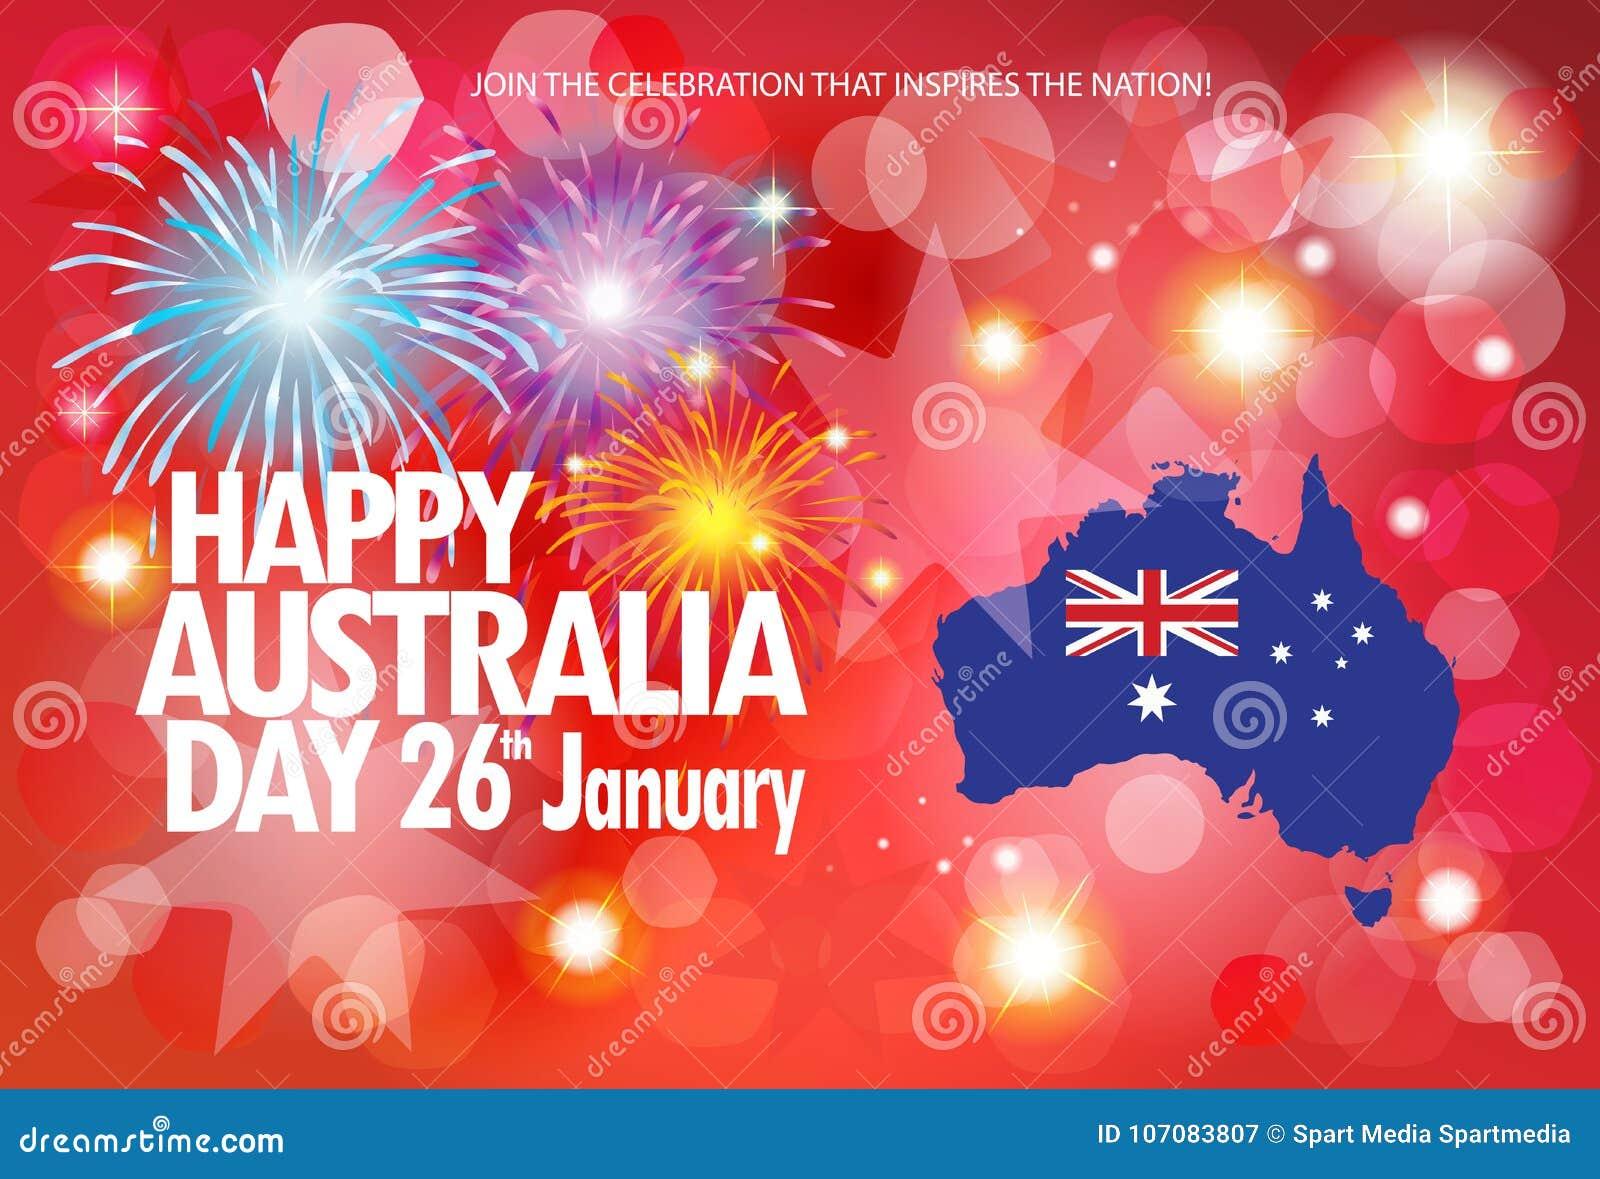 Happy australia day greeting fireworks poster stock vector happy australia day greeting fireworks poster m4hsunfo